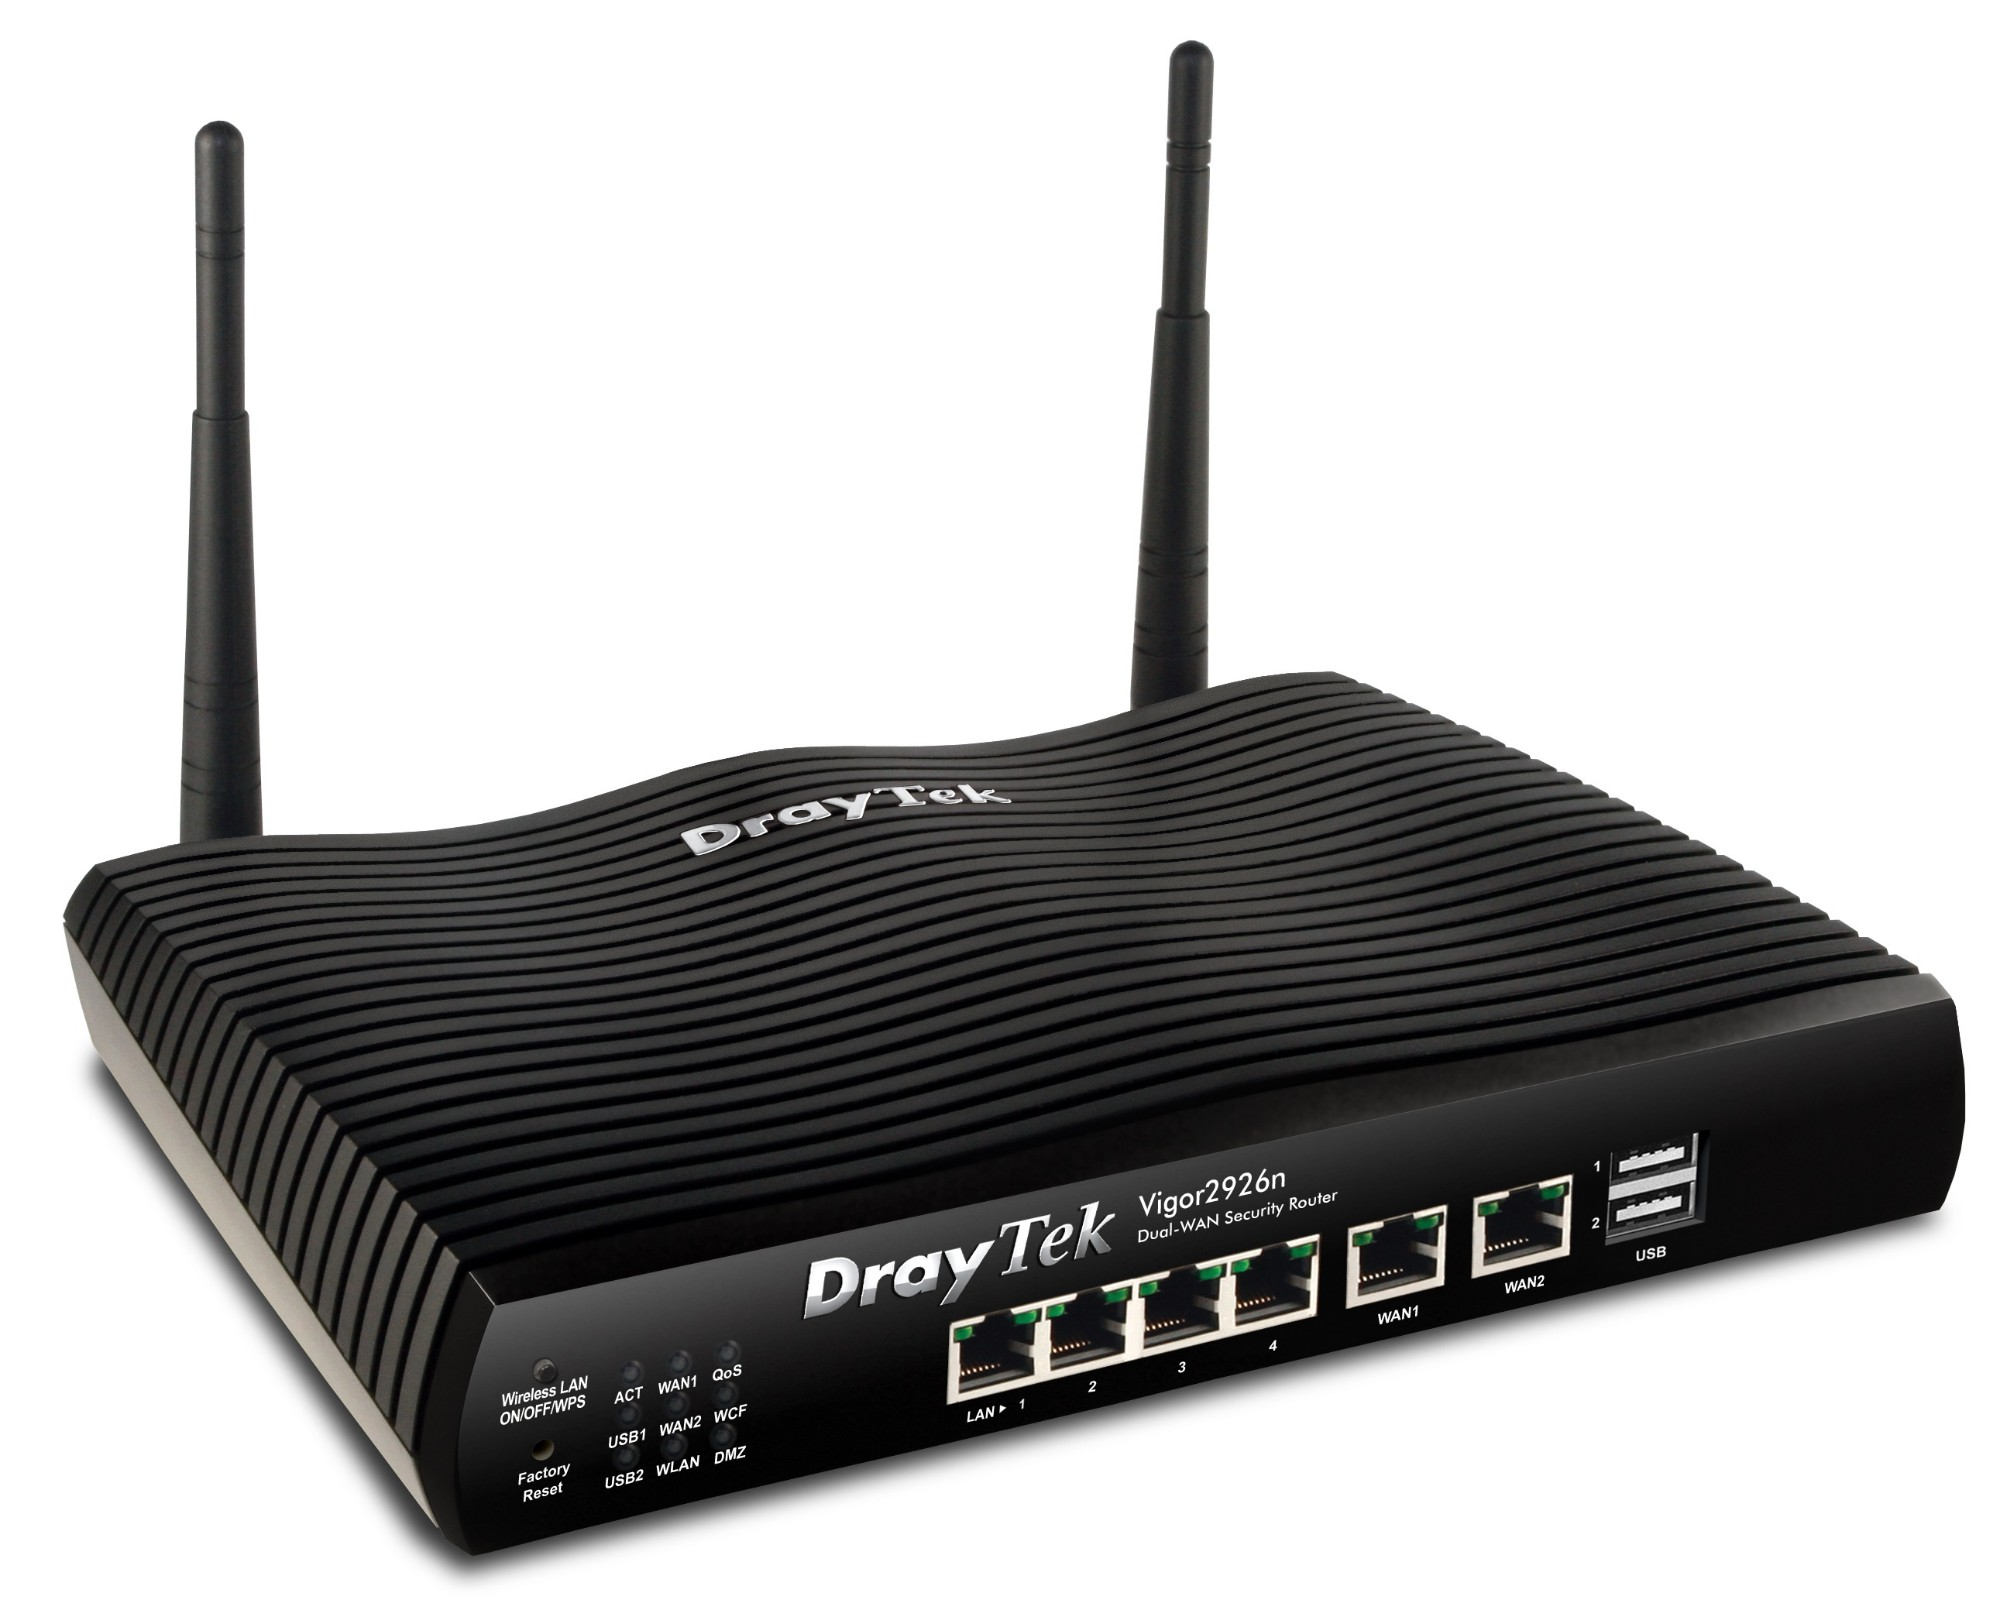 Draytek Vigor 2926n High performance dual-WAN Router/Firewall with SSL VPN and WLAN with WiFi 802.11n